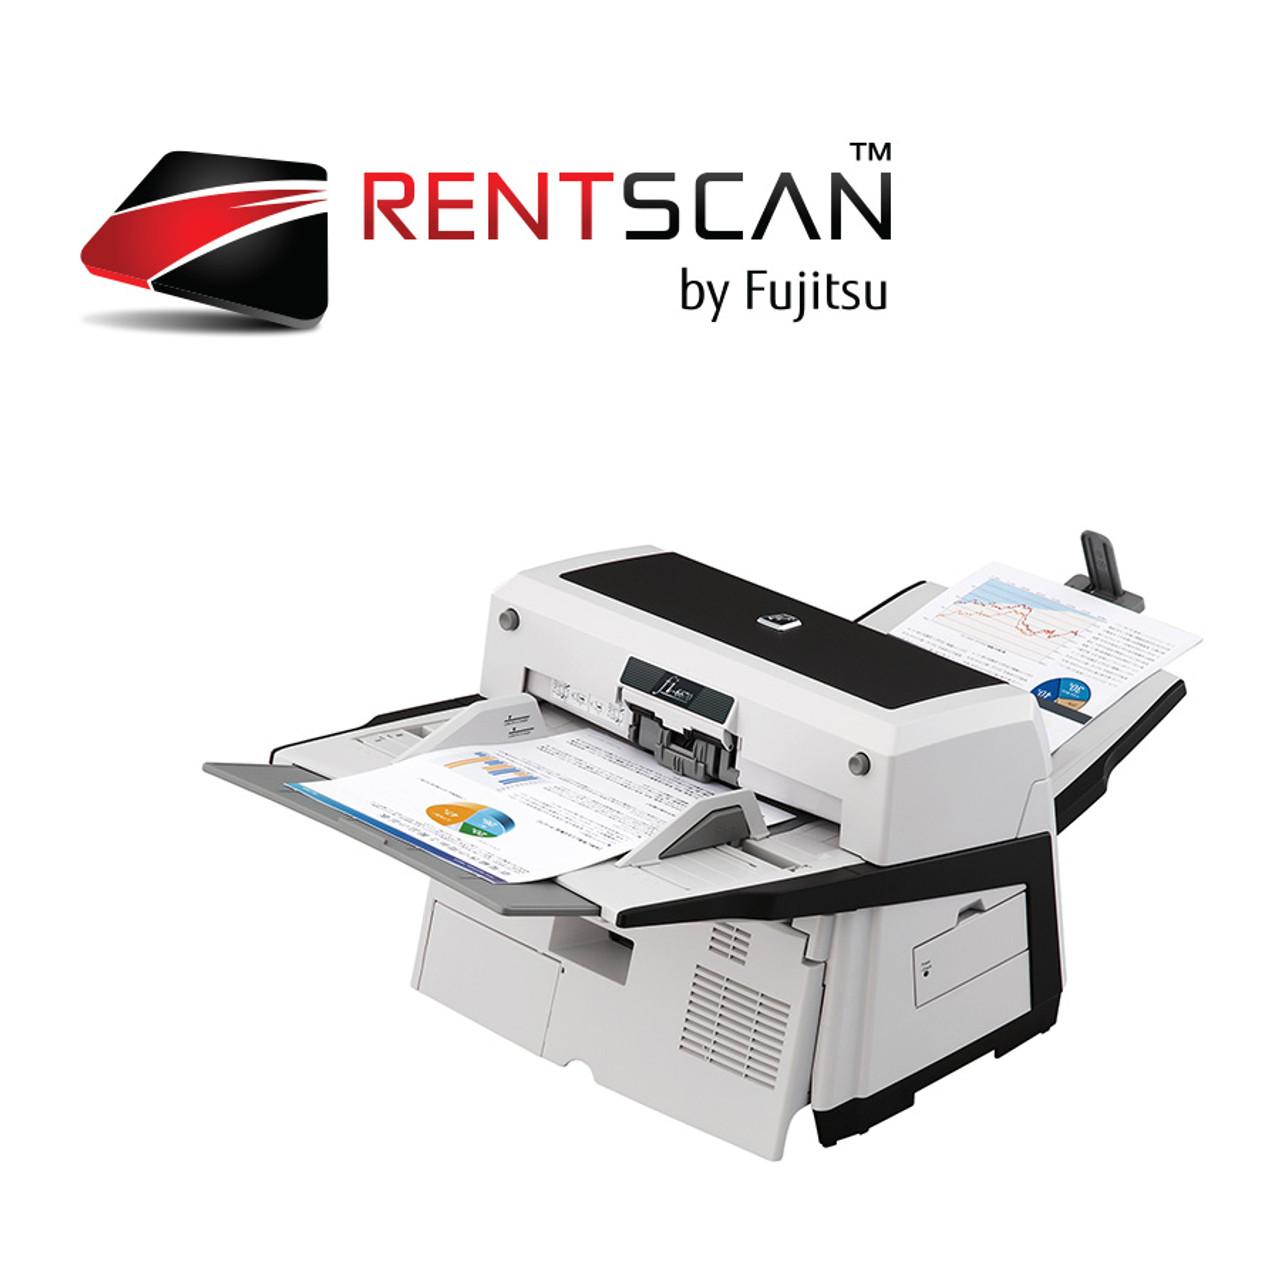 Fujitsu fi-6670 Scanner Rental, RentScan | Fujitsu Scanner Store